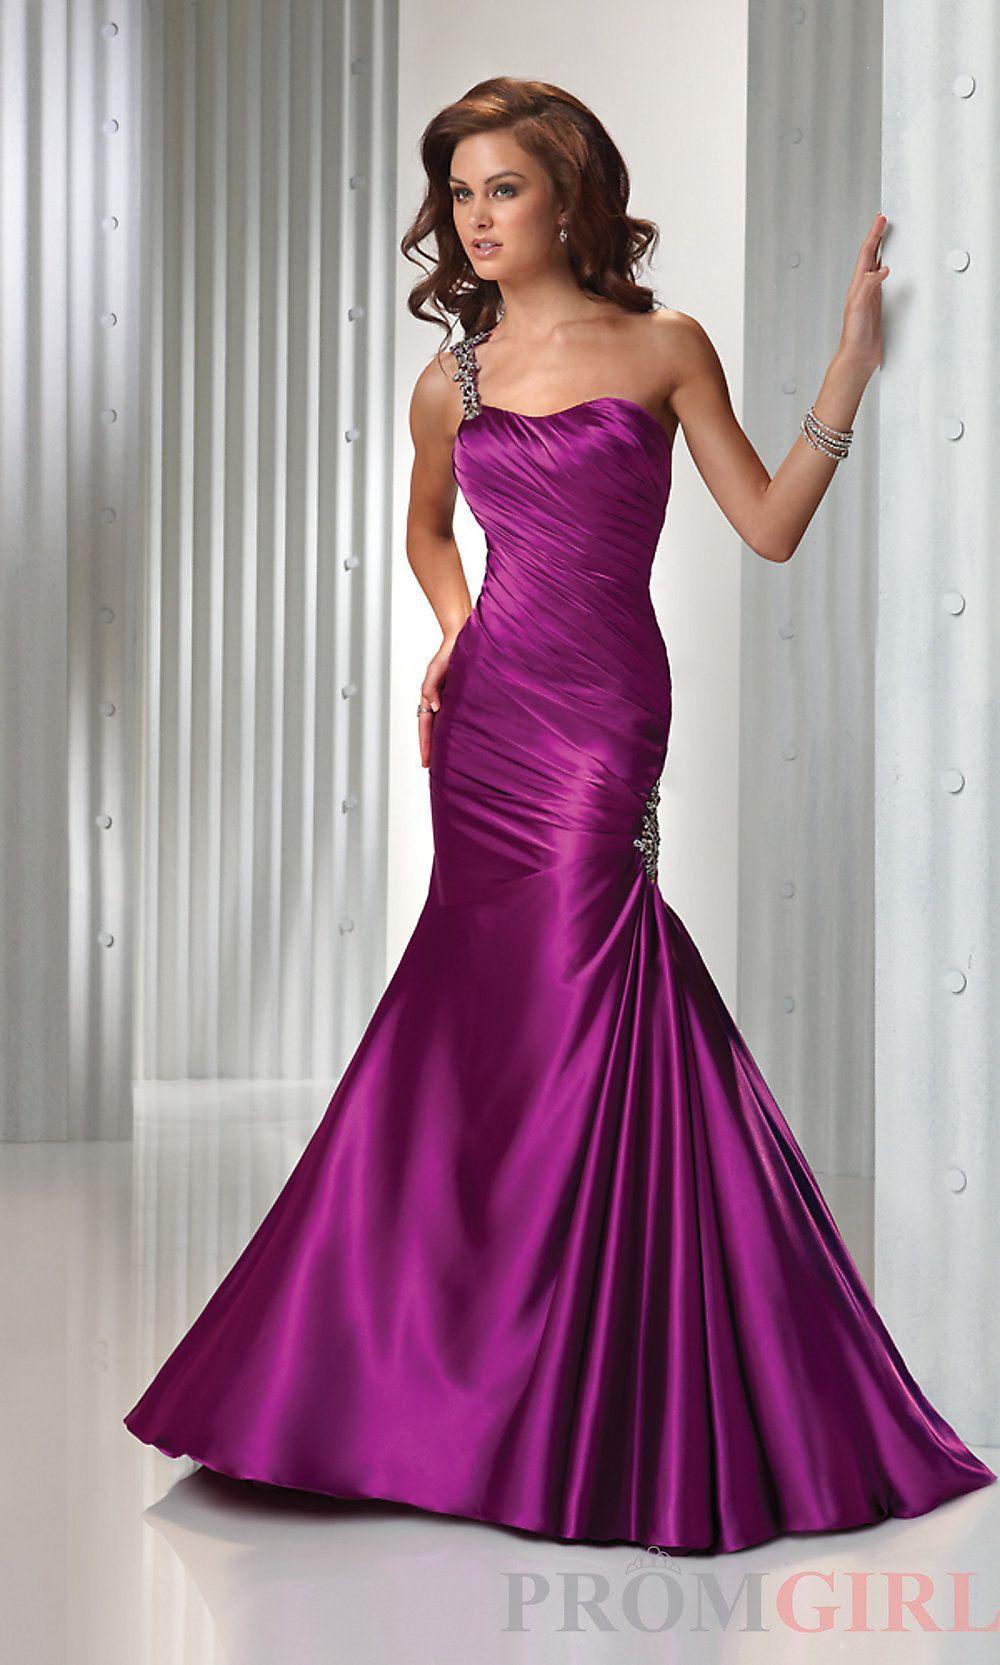 FrontView promgirl.com | Vestidos fucsia rosados magenta largos ...